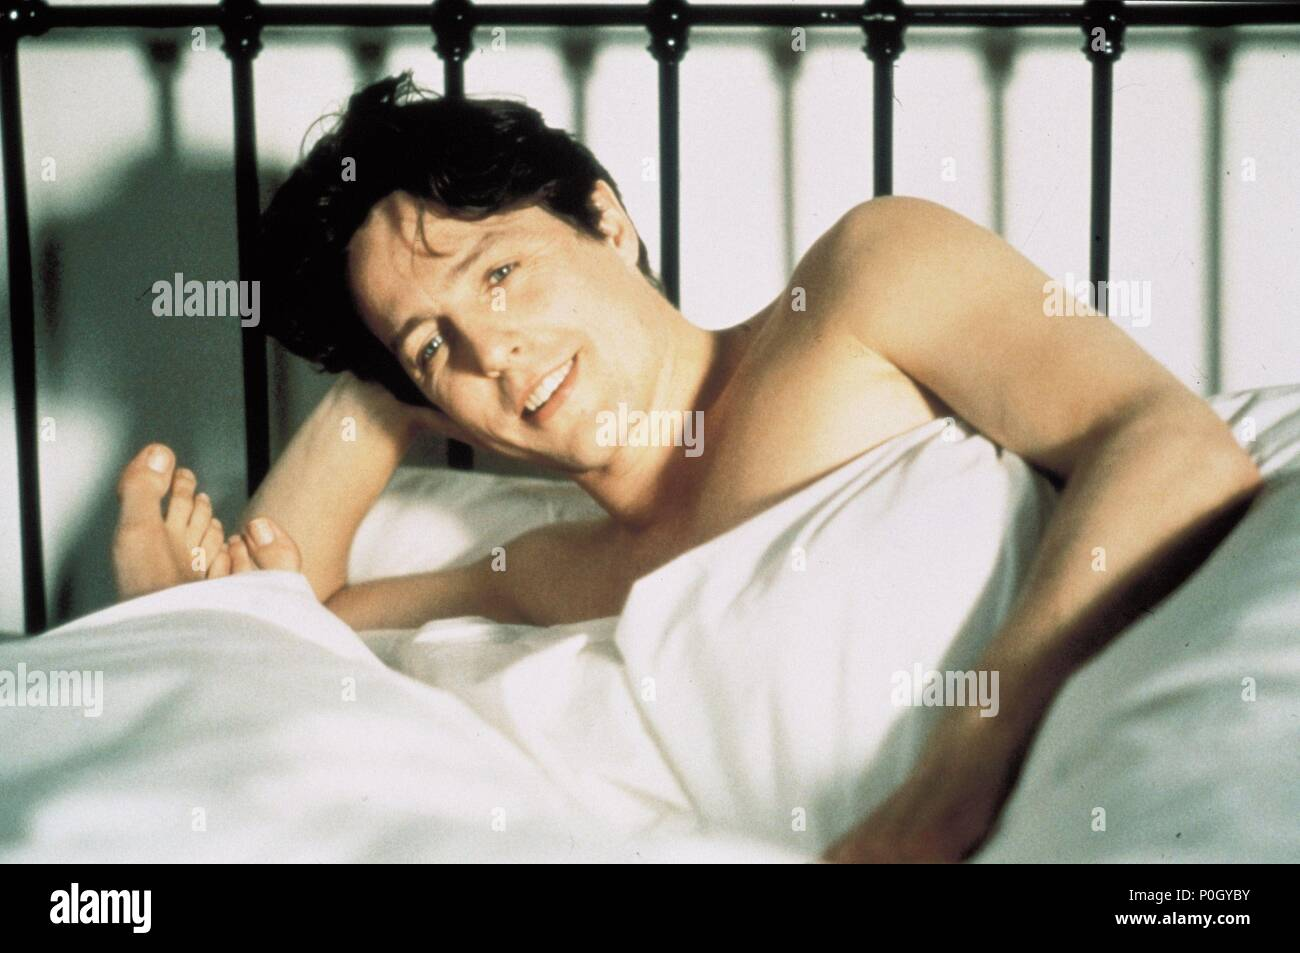 Original Film Title: NOTTING HILL.  English Title: NOTTING HILL.  Film Director: ROGER MICHELL.  Year: 1999.  Stars: HUGH GRANT. Credit: POLYGRAM / Album - Stock Image